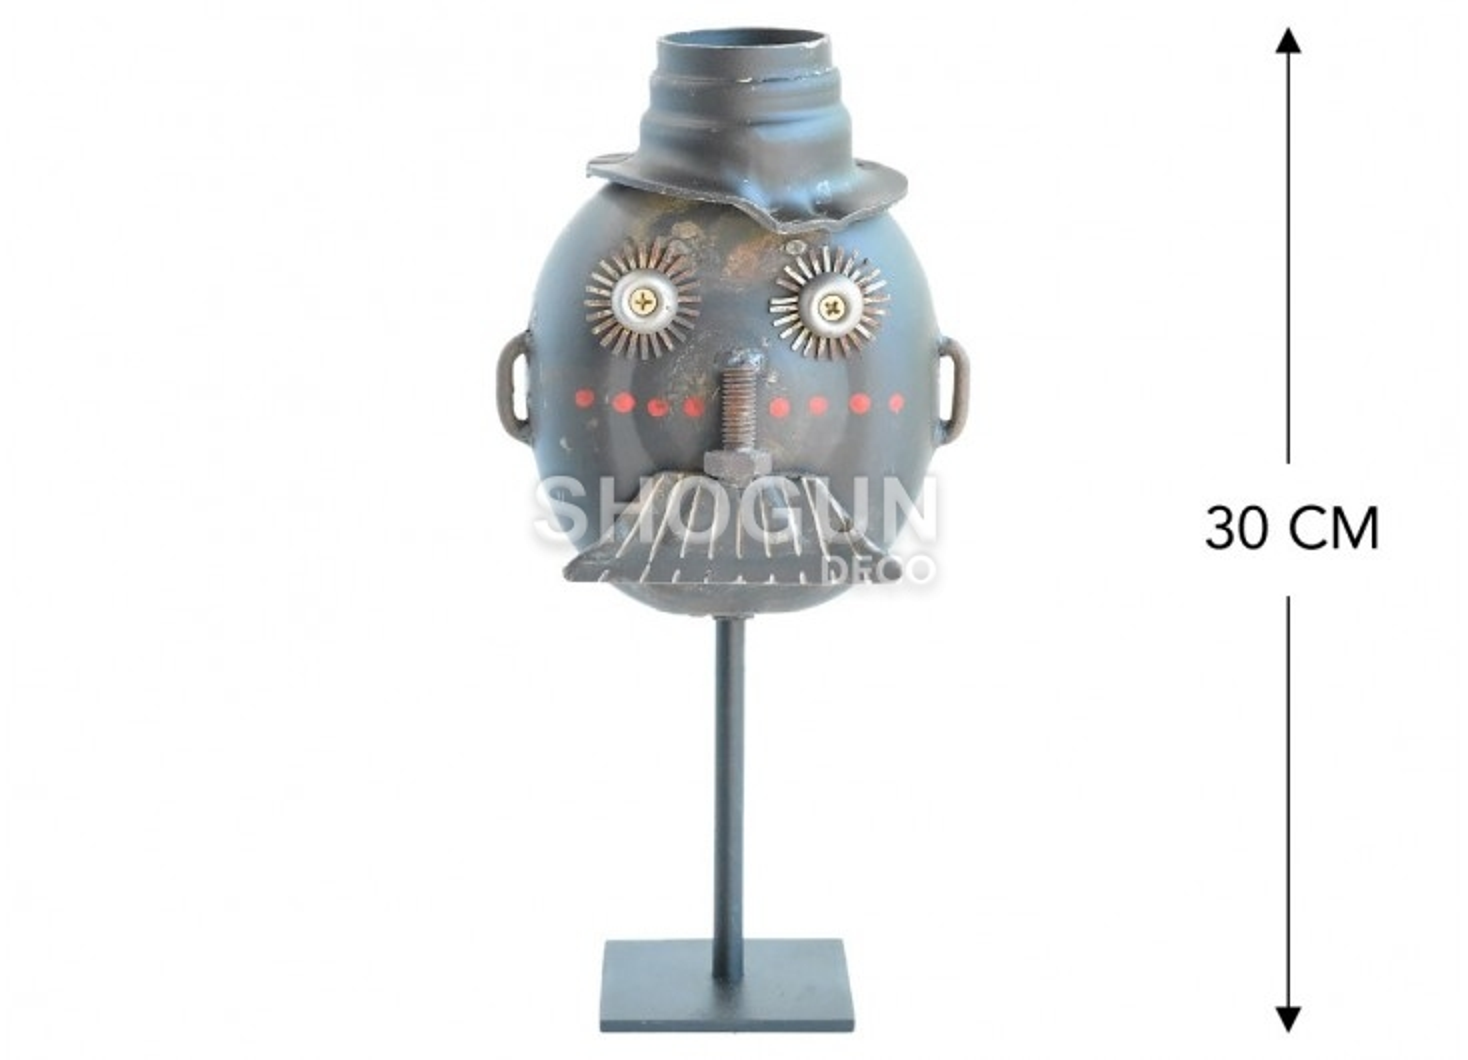 Masque décoratif en métal recyclé - XS18